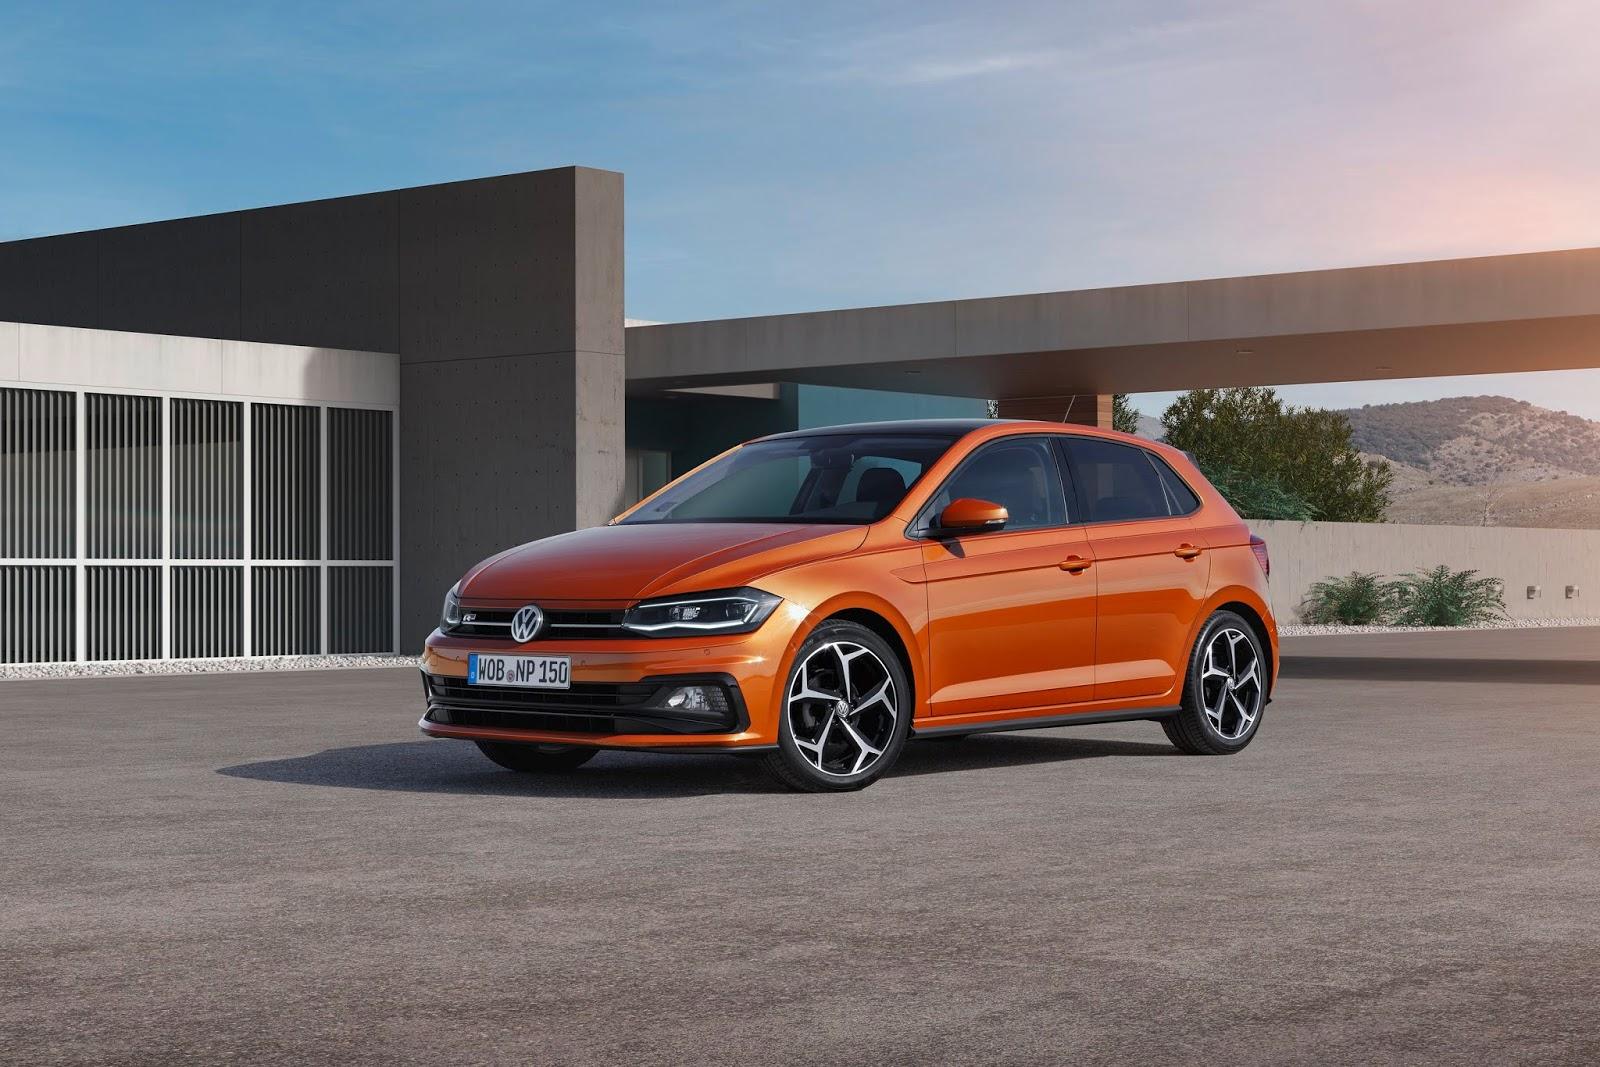 VOLKSWAGEN2BPOLO Deal Days με όφελος ως 4.000 ευρώ από τη Volkswagen! Kosmocar, Volkswagen, VW, αγορά, καινούρια, Καρέντα, προσφορές, τιμες